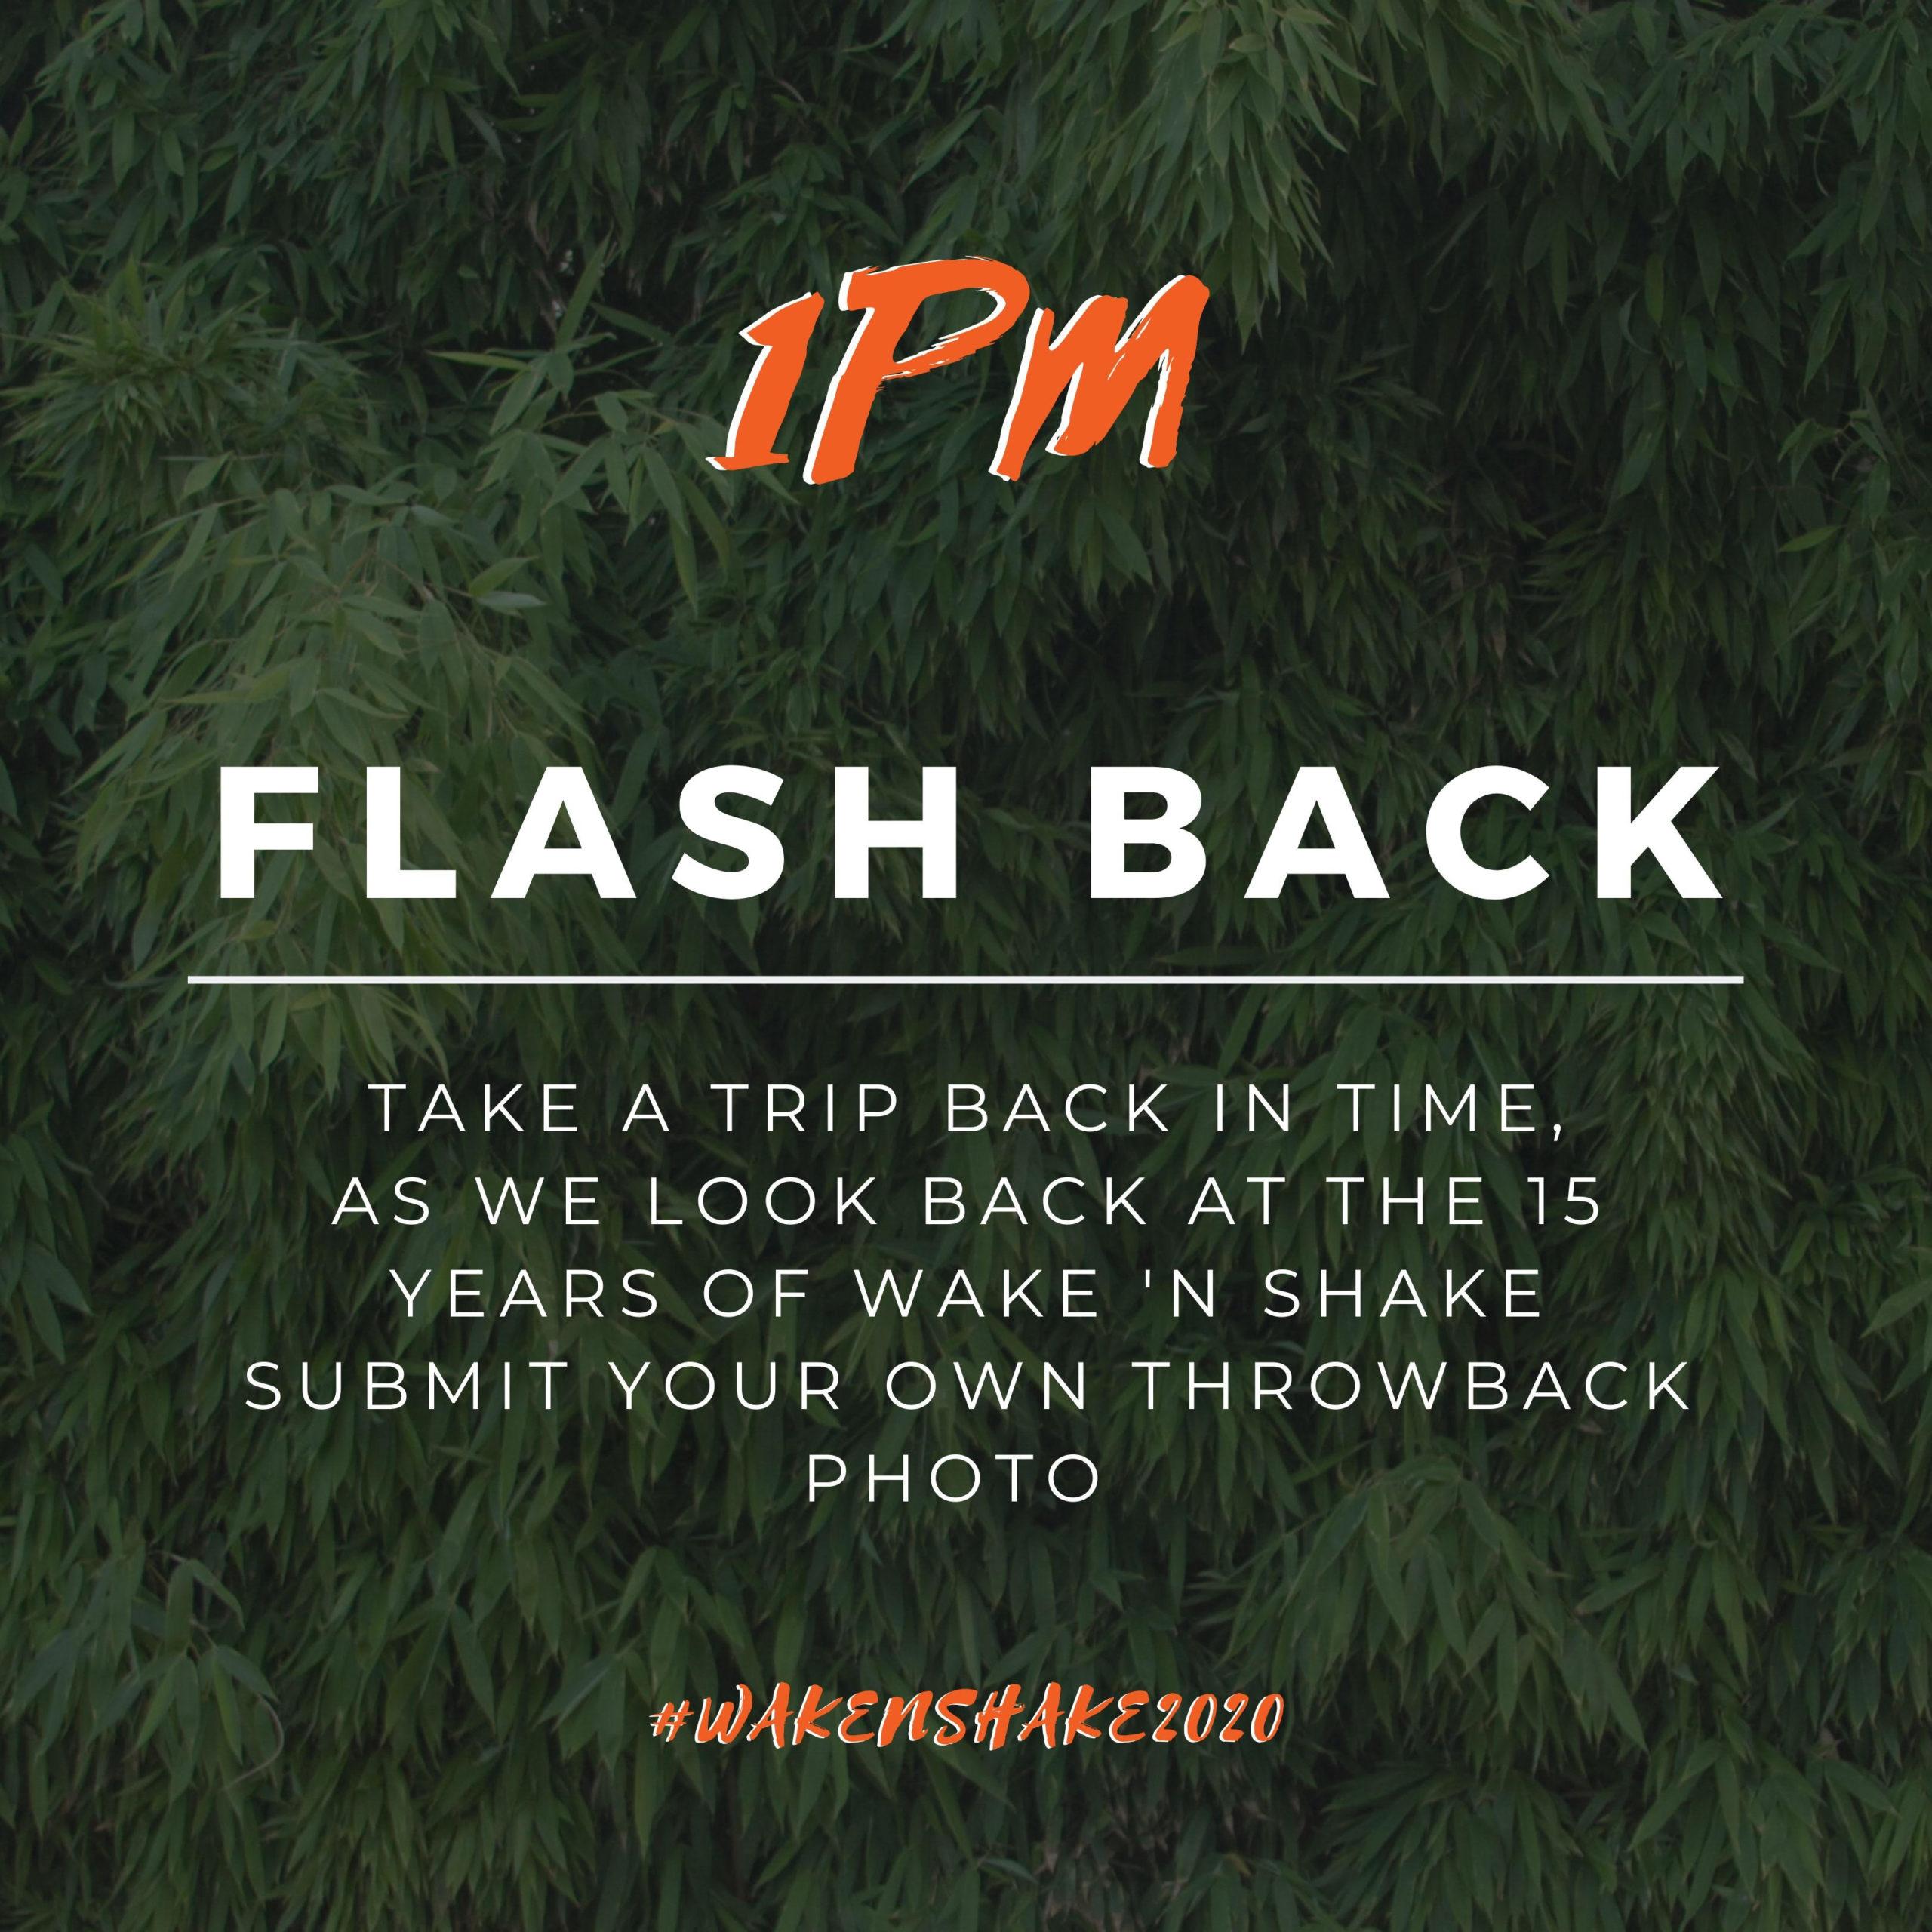 1 pm-flashback hour